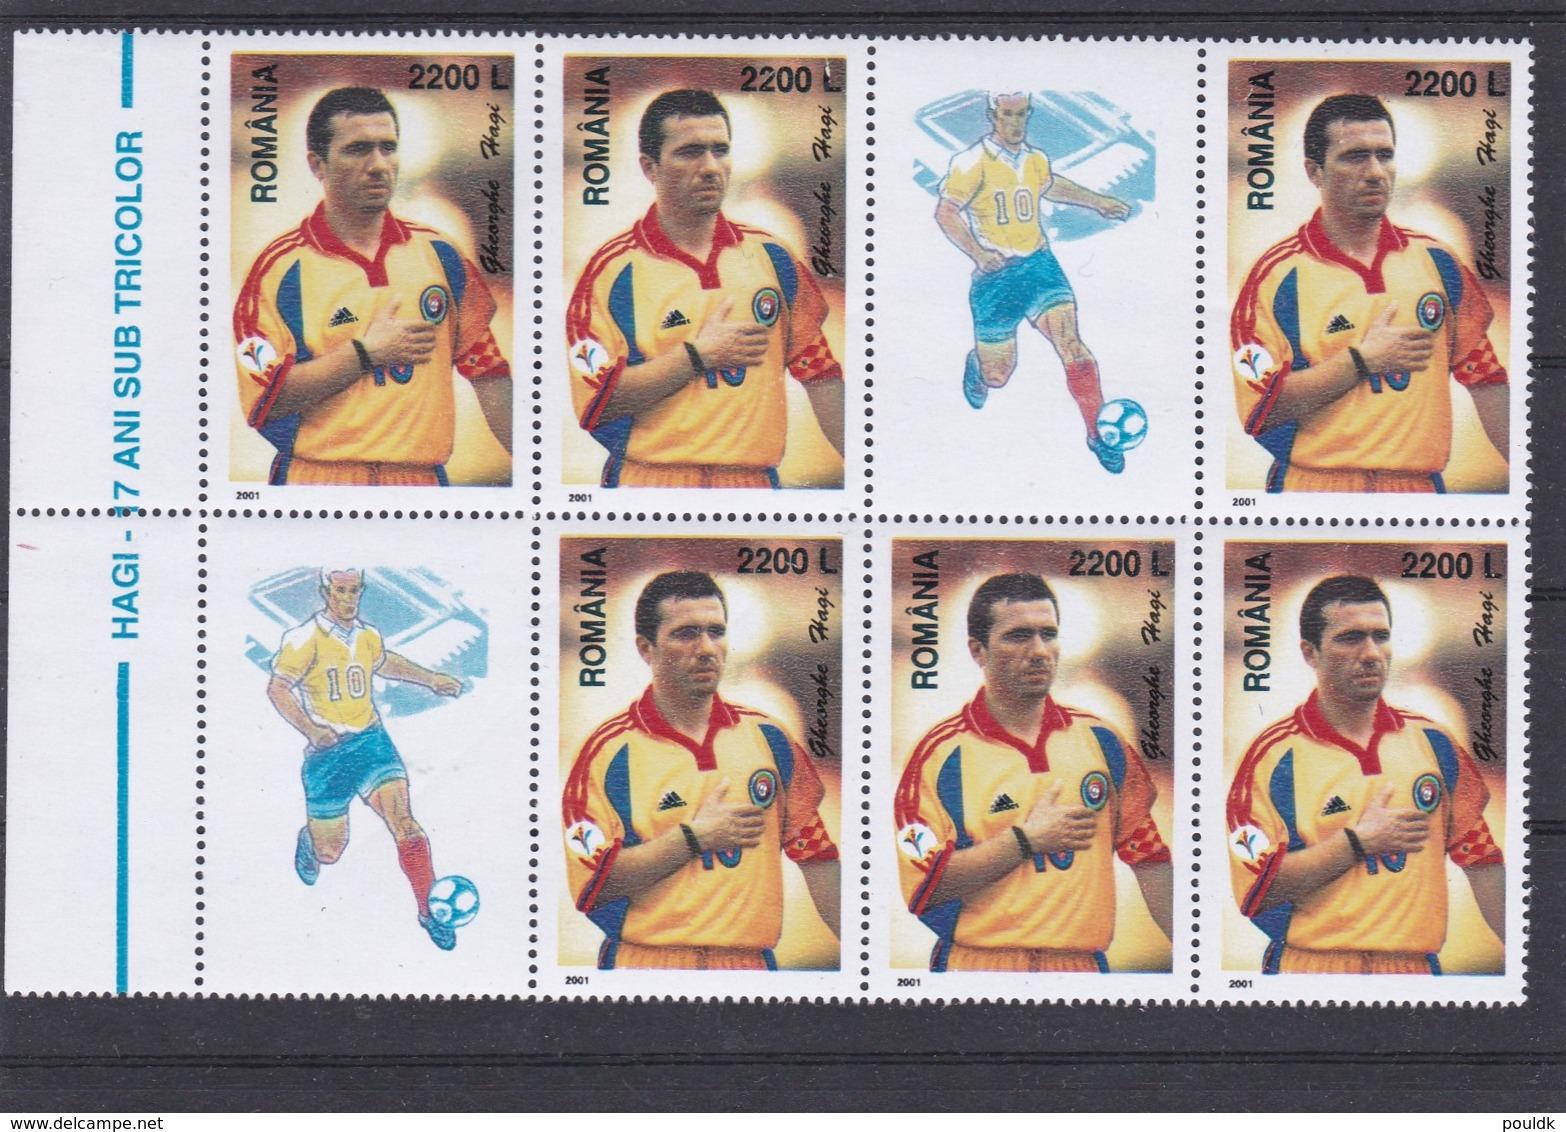 Romania 2001 Hagi Football Player  MNH/** (H49) - Voetbal